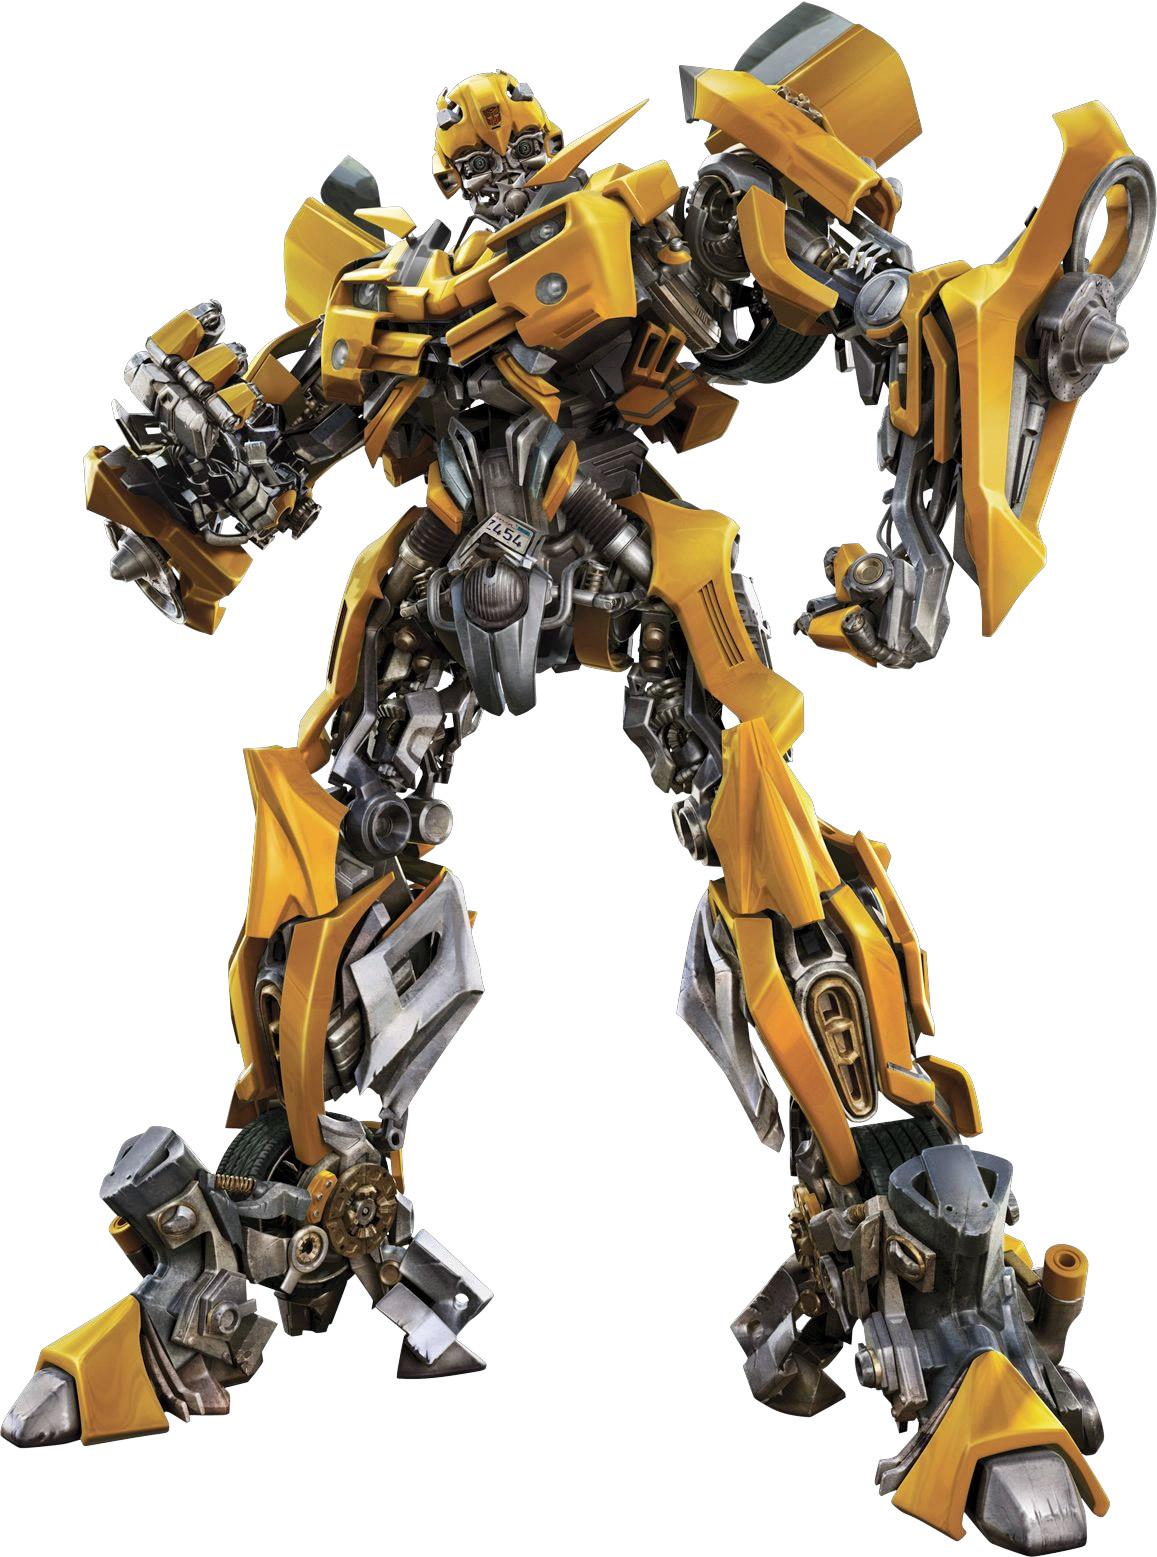 Bumblebee transformers wallpaper HQ WALLPAPER   178717 1157x1557